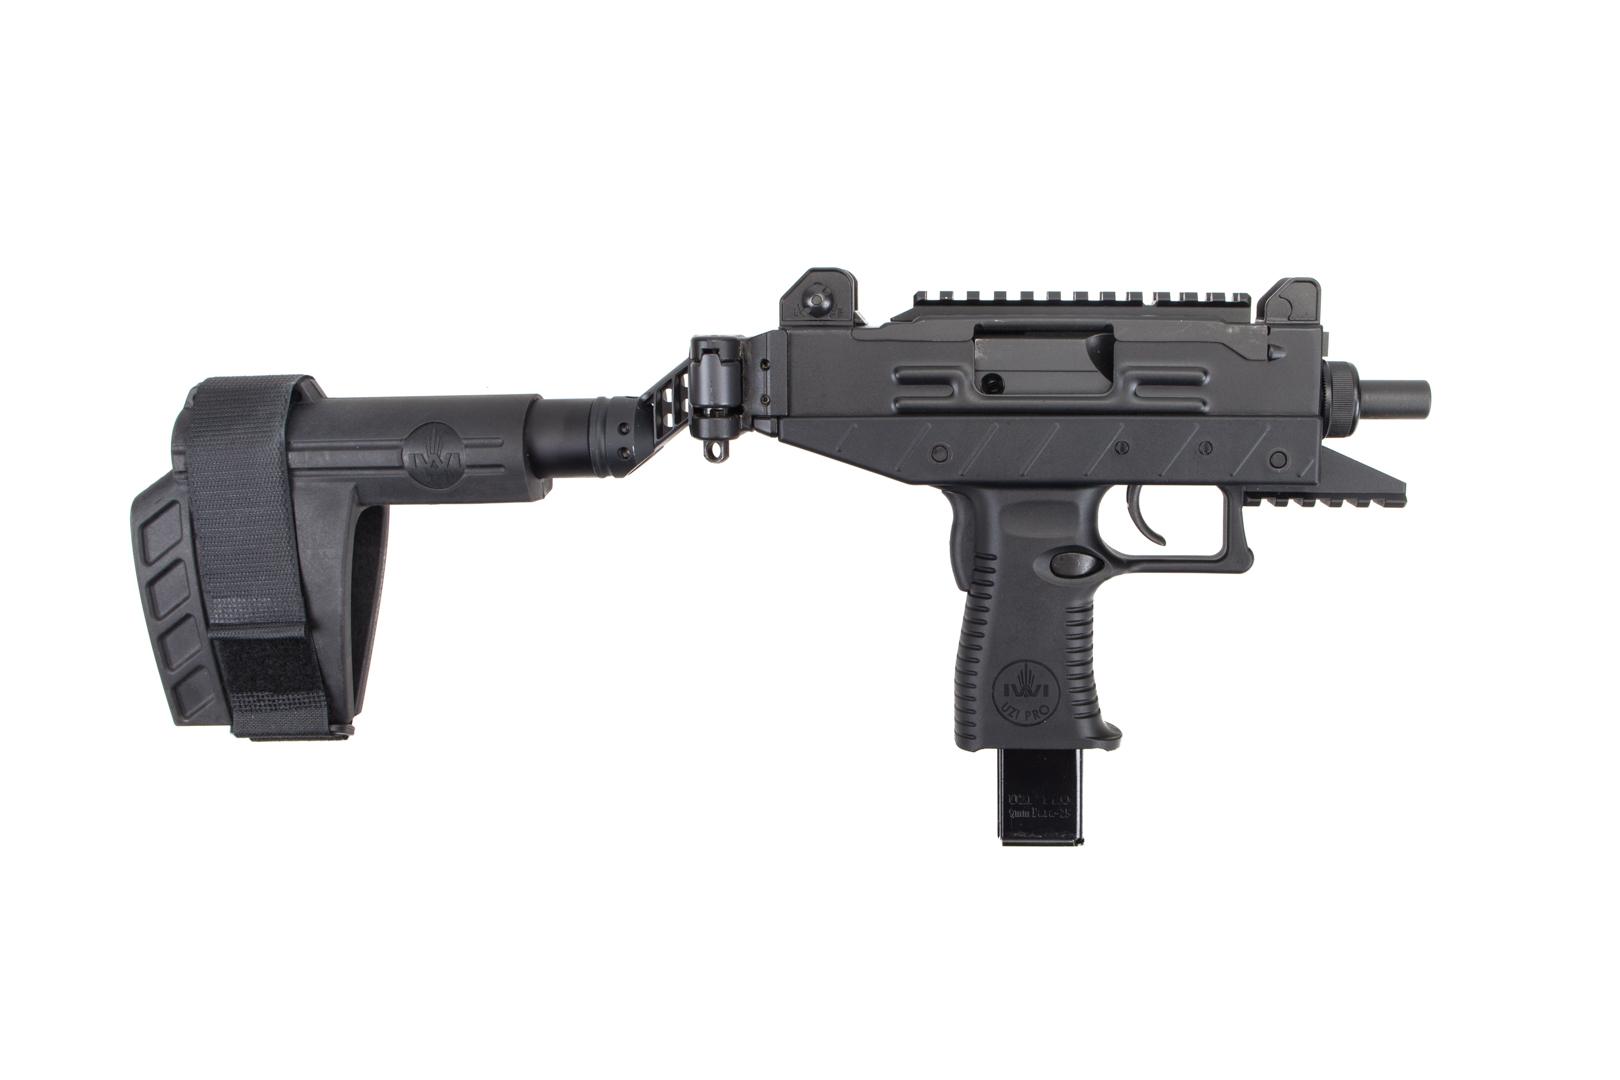 IWI Uzi Pro 9mm w/ Stabilizing Brace (USED)